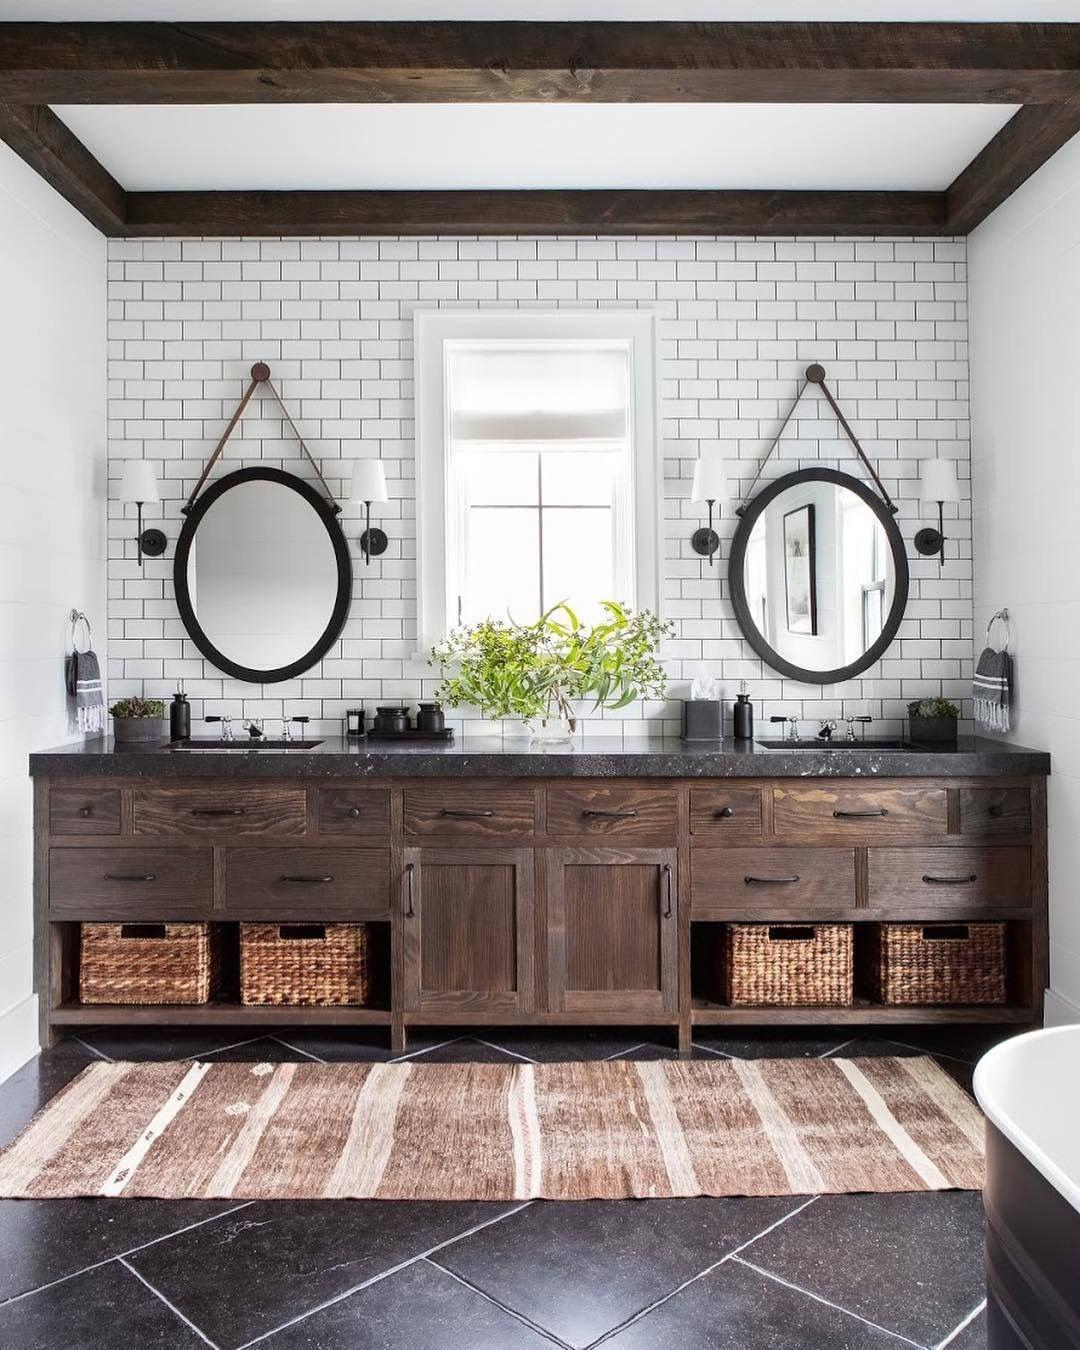 Pin By Angela Lojacono On Home Modern Farmhouse Bathroom Home Bathroom Inspiration